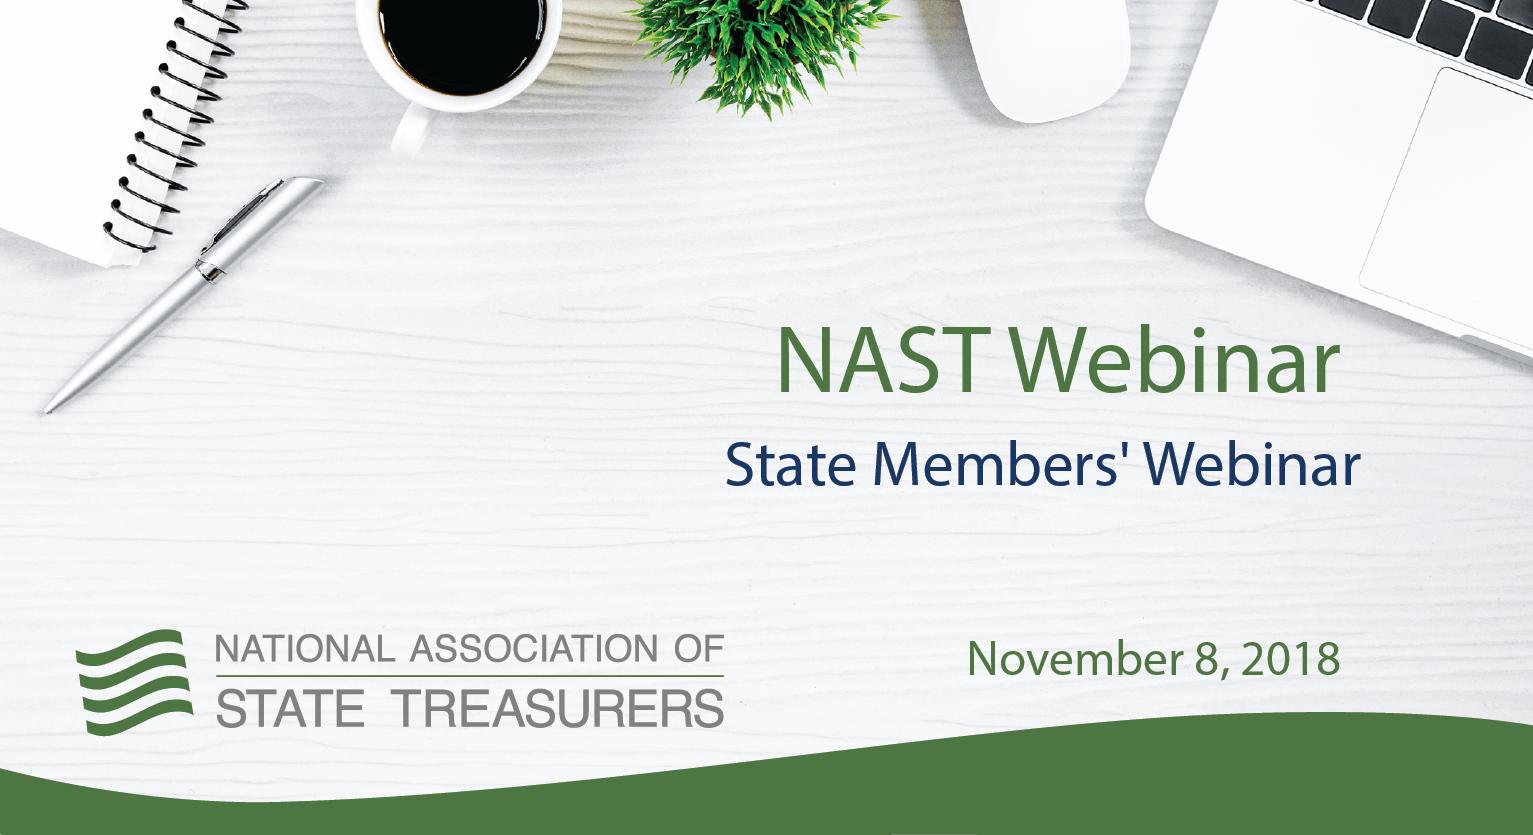 State Members' Webinar